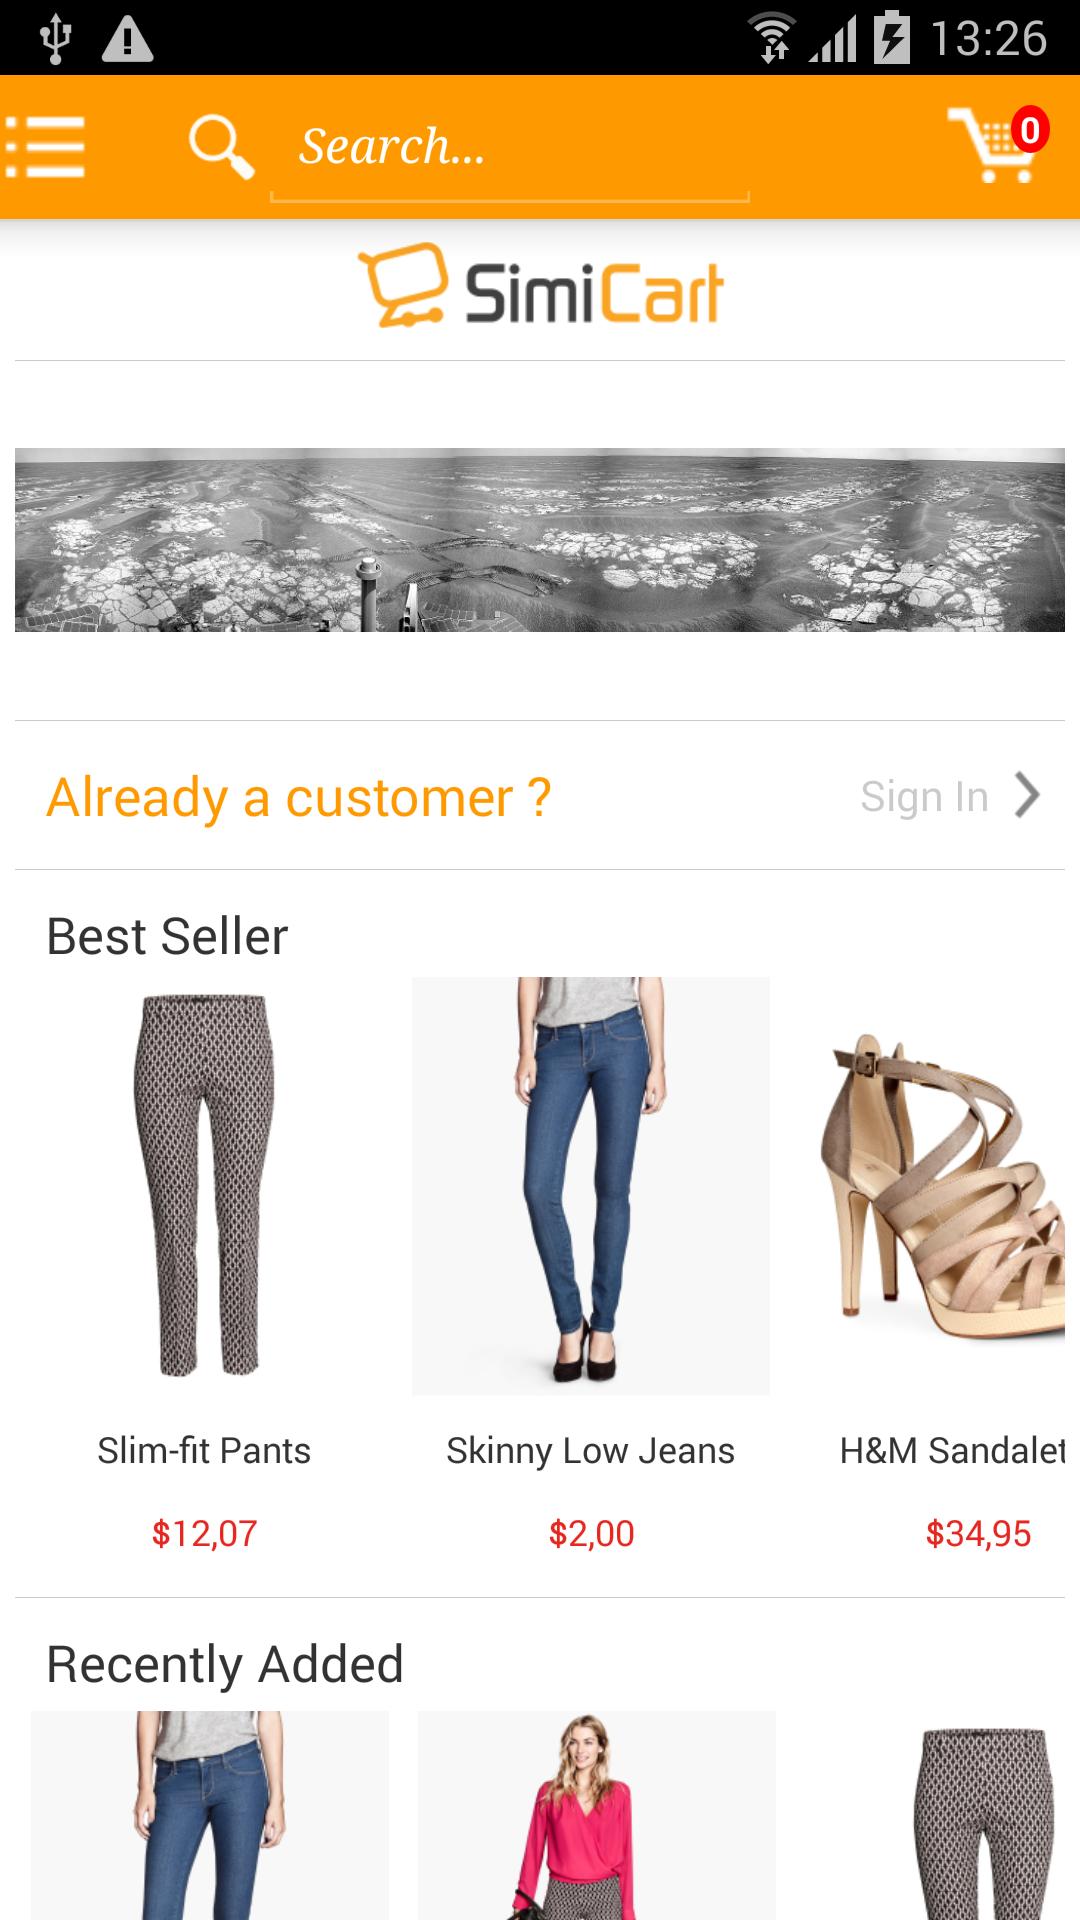 "M-commerce - Mobile Shopping App - Magento Mobile App Builder - Android"" ><img src="